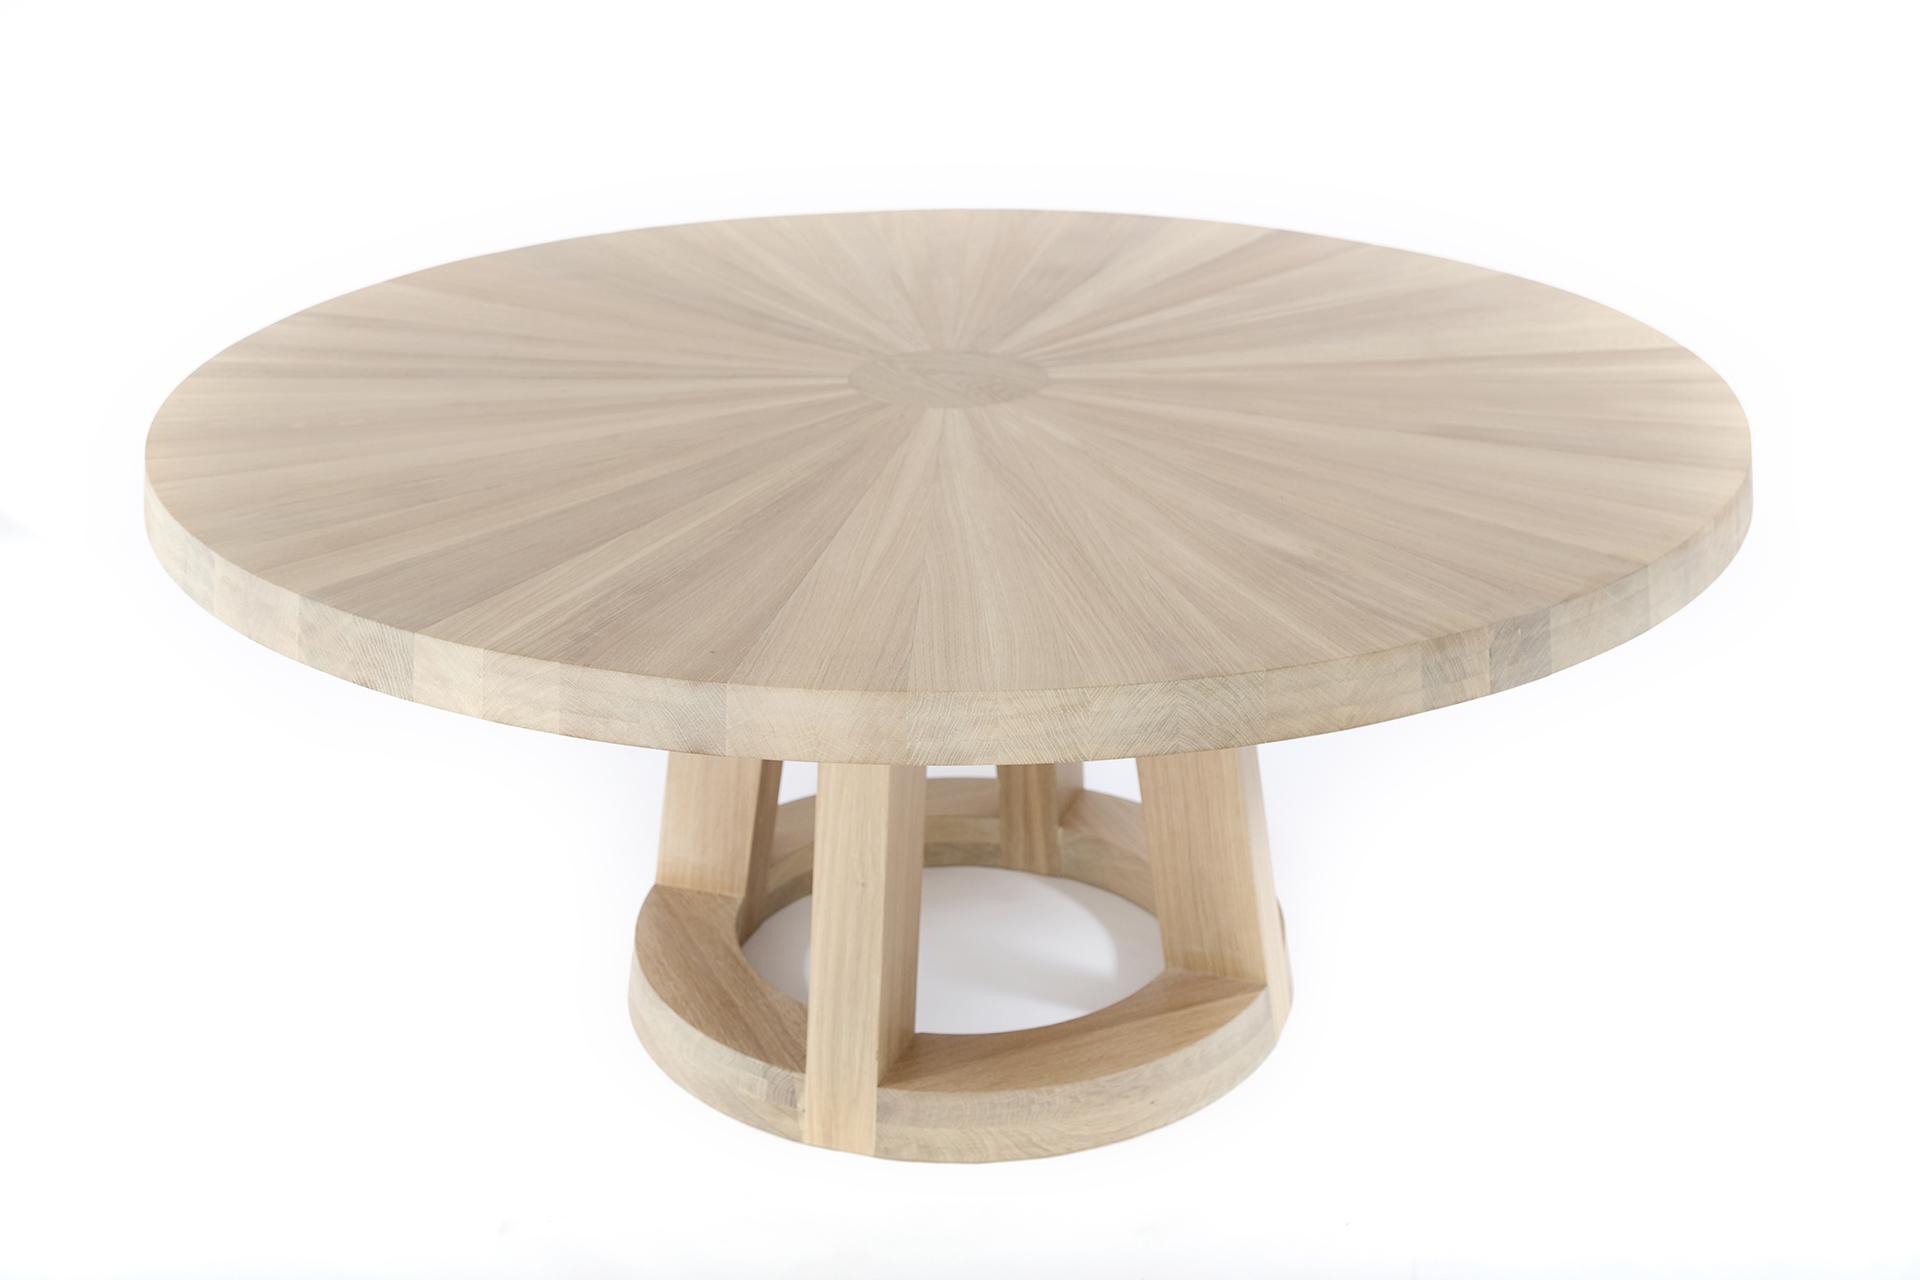 Tafel Remy Meijers : Solid runder design tisch l remy meijers l odesi. your dutch design.